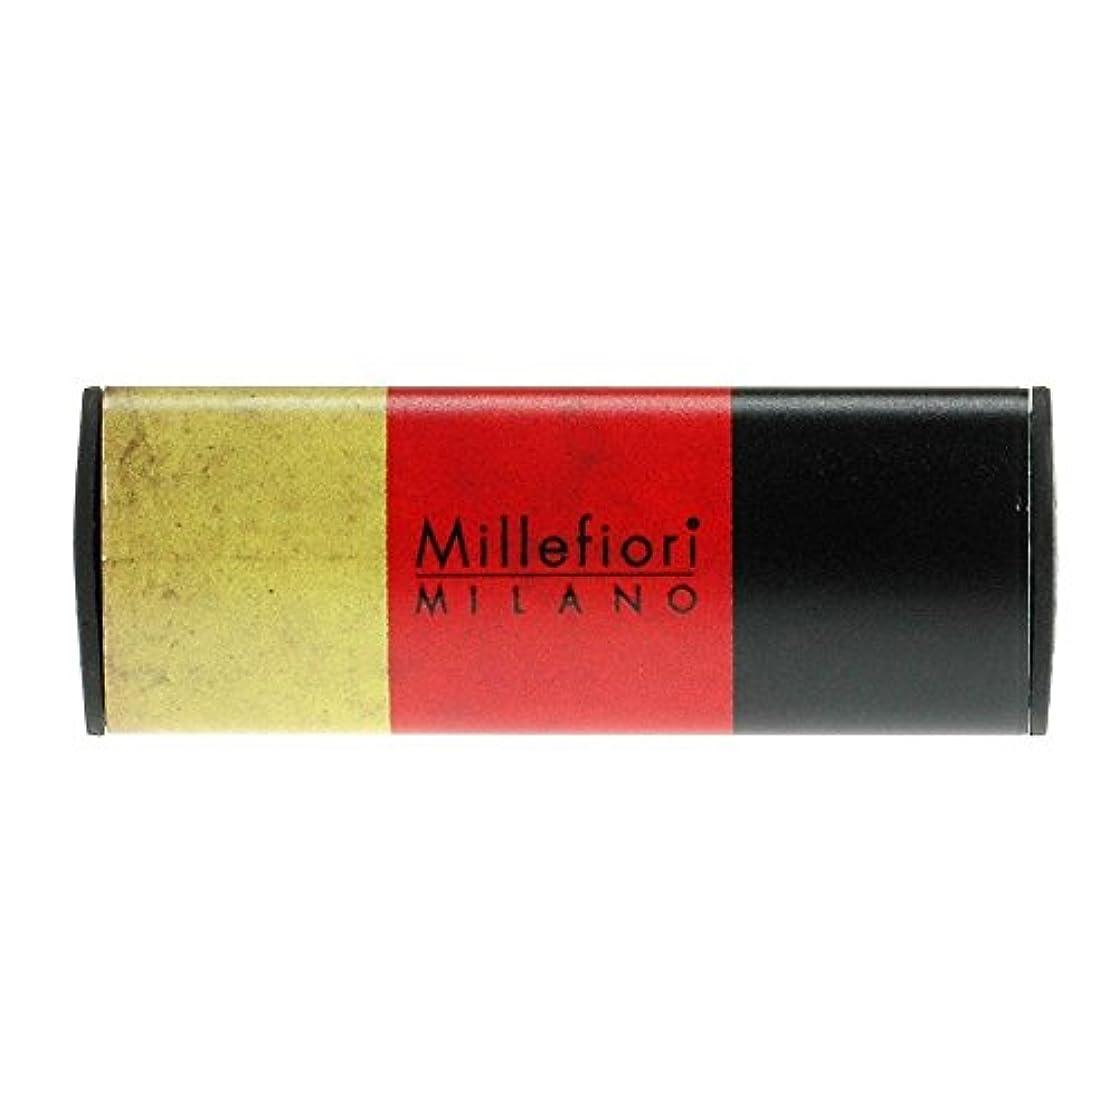 Millefiori カーエアフレッシュナー FLAG スパイシーウッド CDIF-G-003